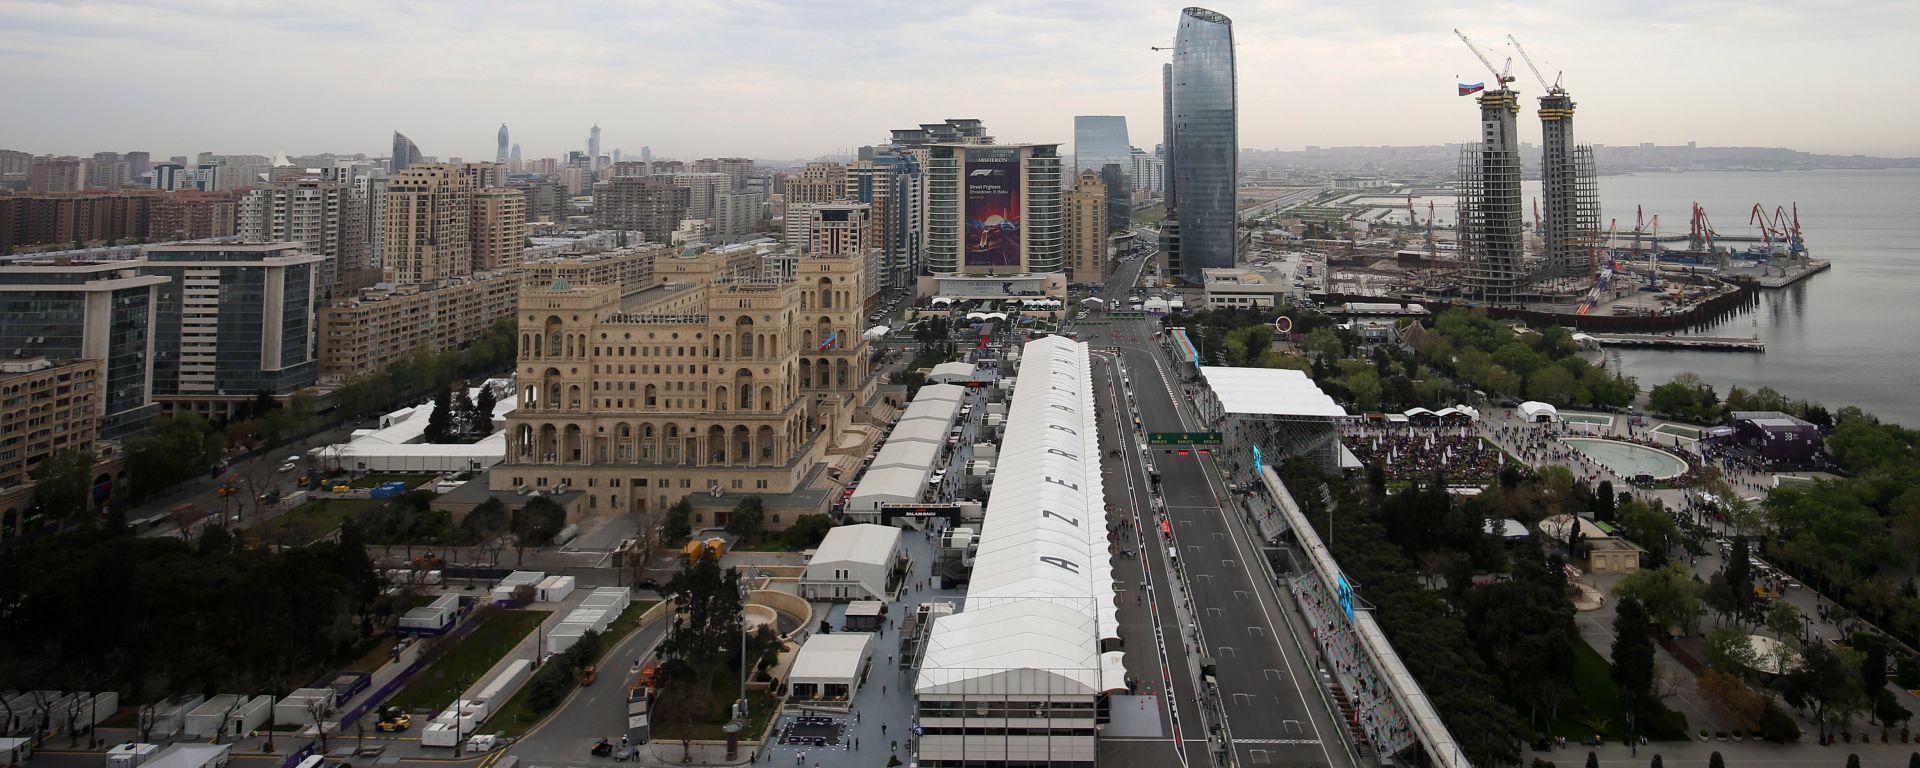 F1 GP Azerbaijan 2019, Baku: Atmosfera del circuito